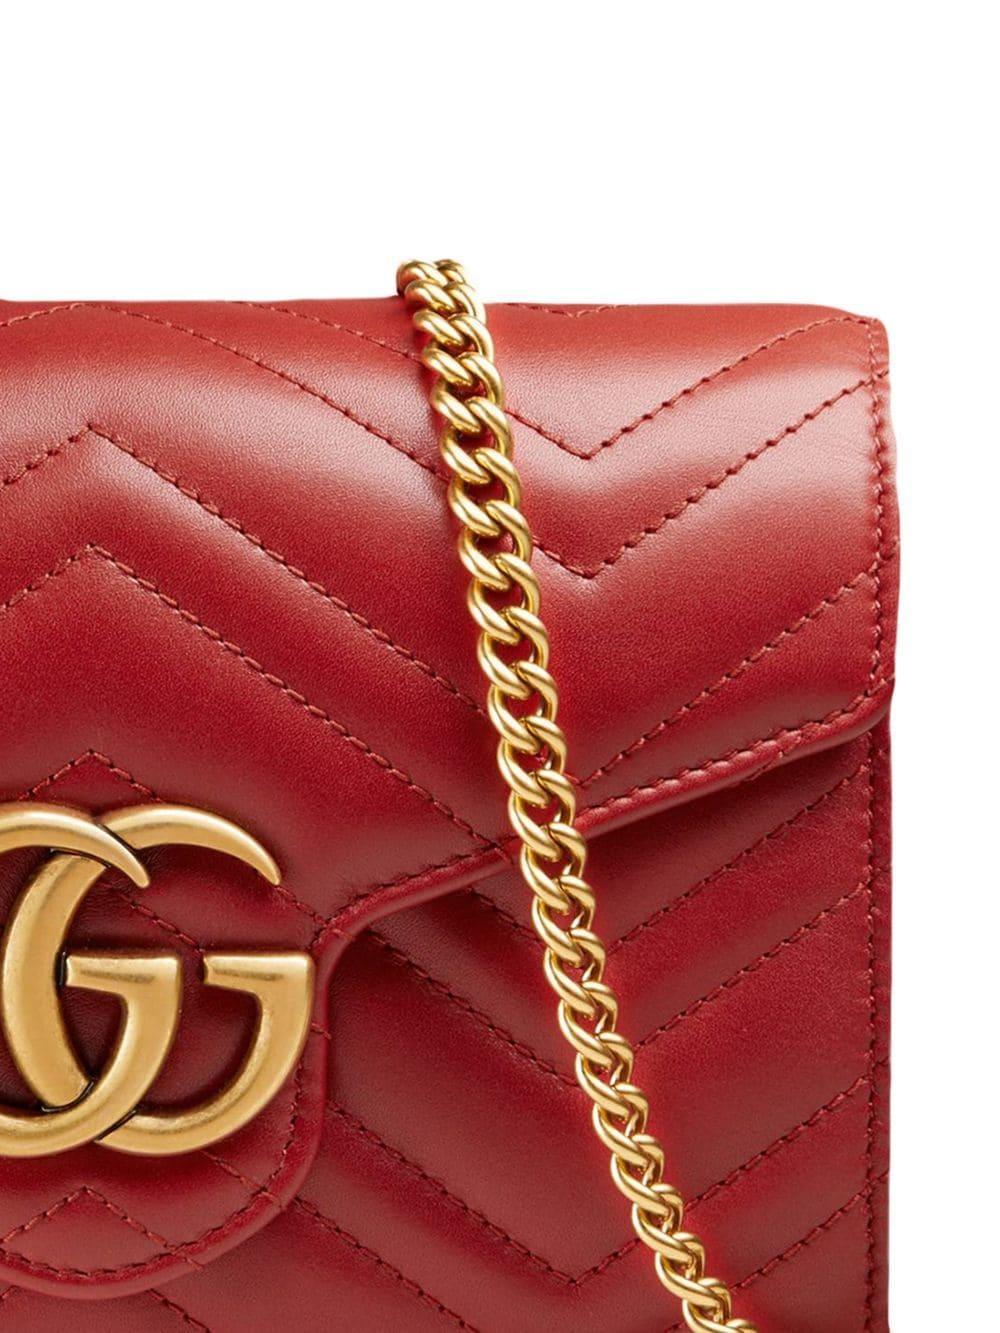 a78f2c746b0 Lyst - Gucci Mini GG Marmont Matelassé Bag in Red